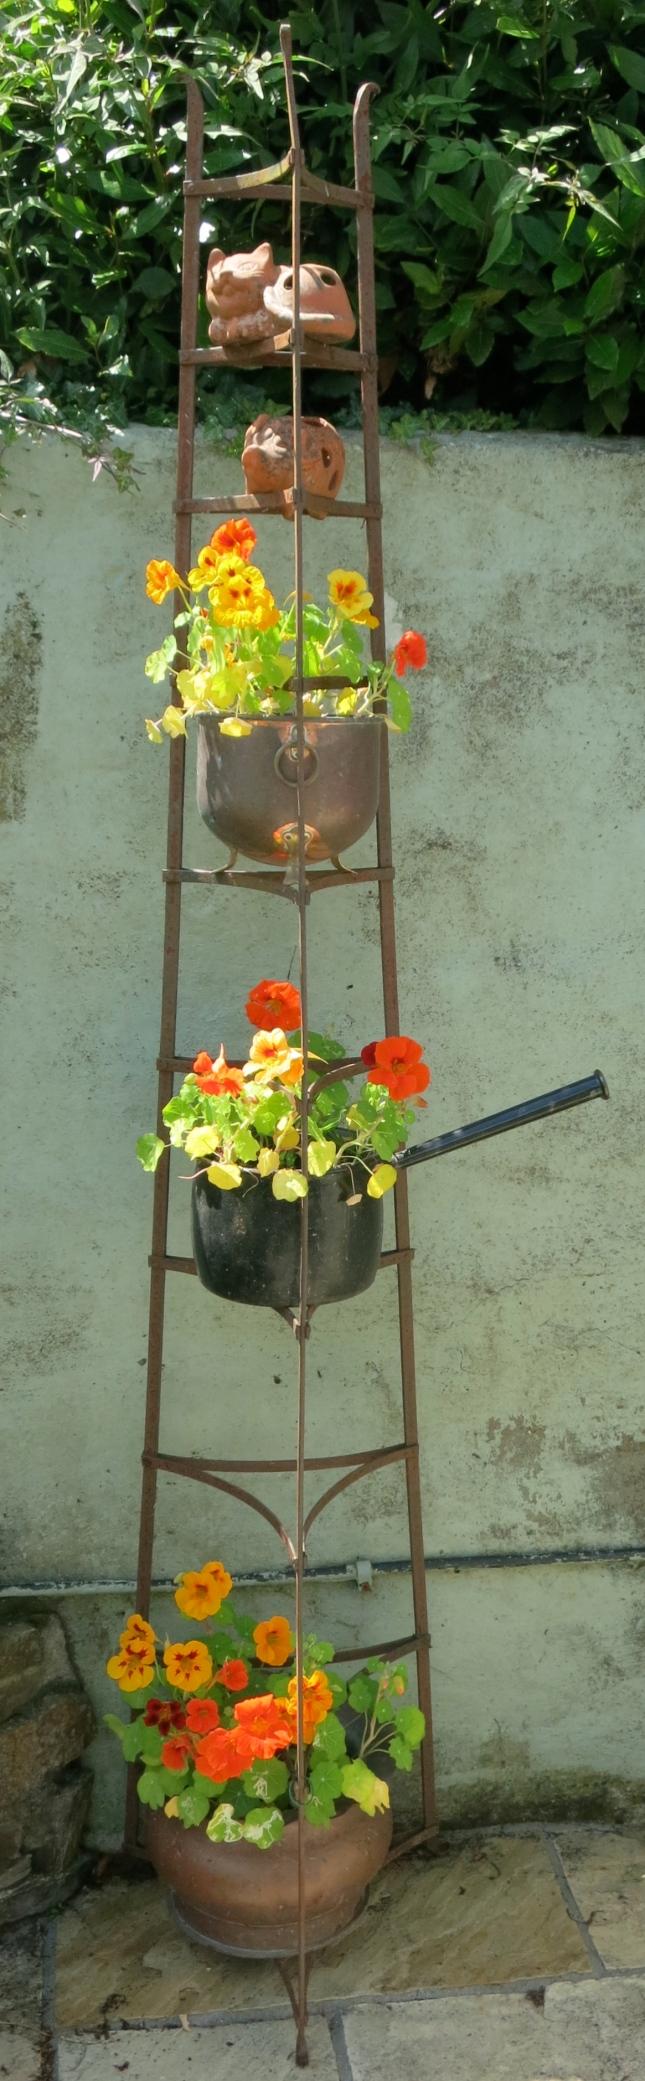 Nasturtium tower